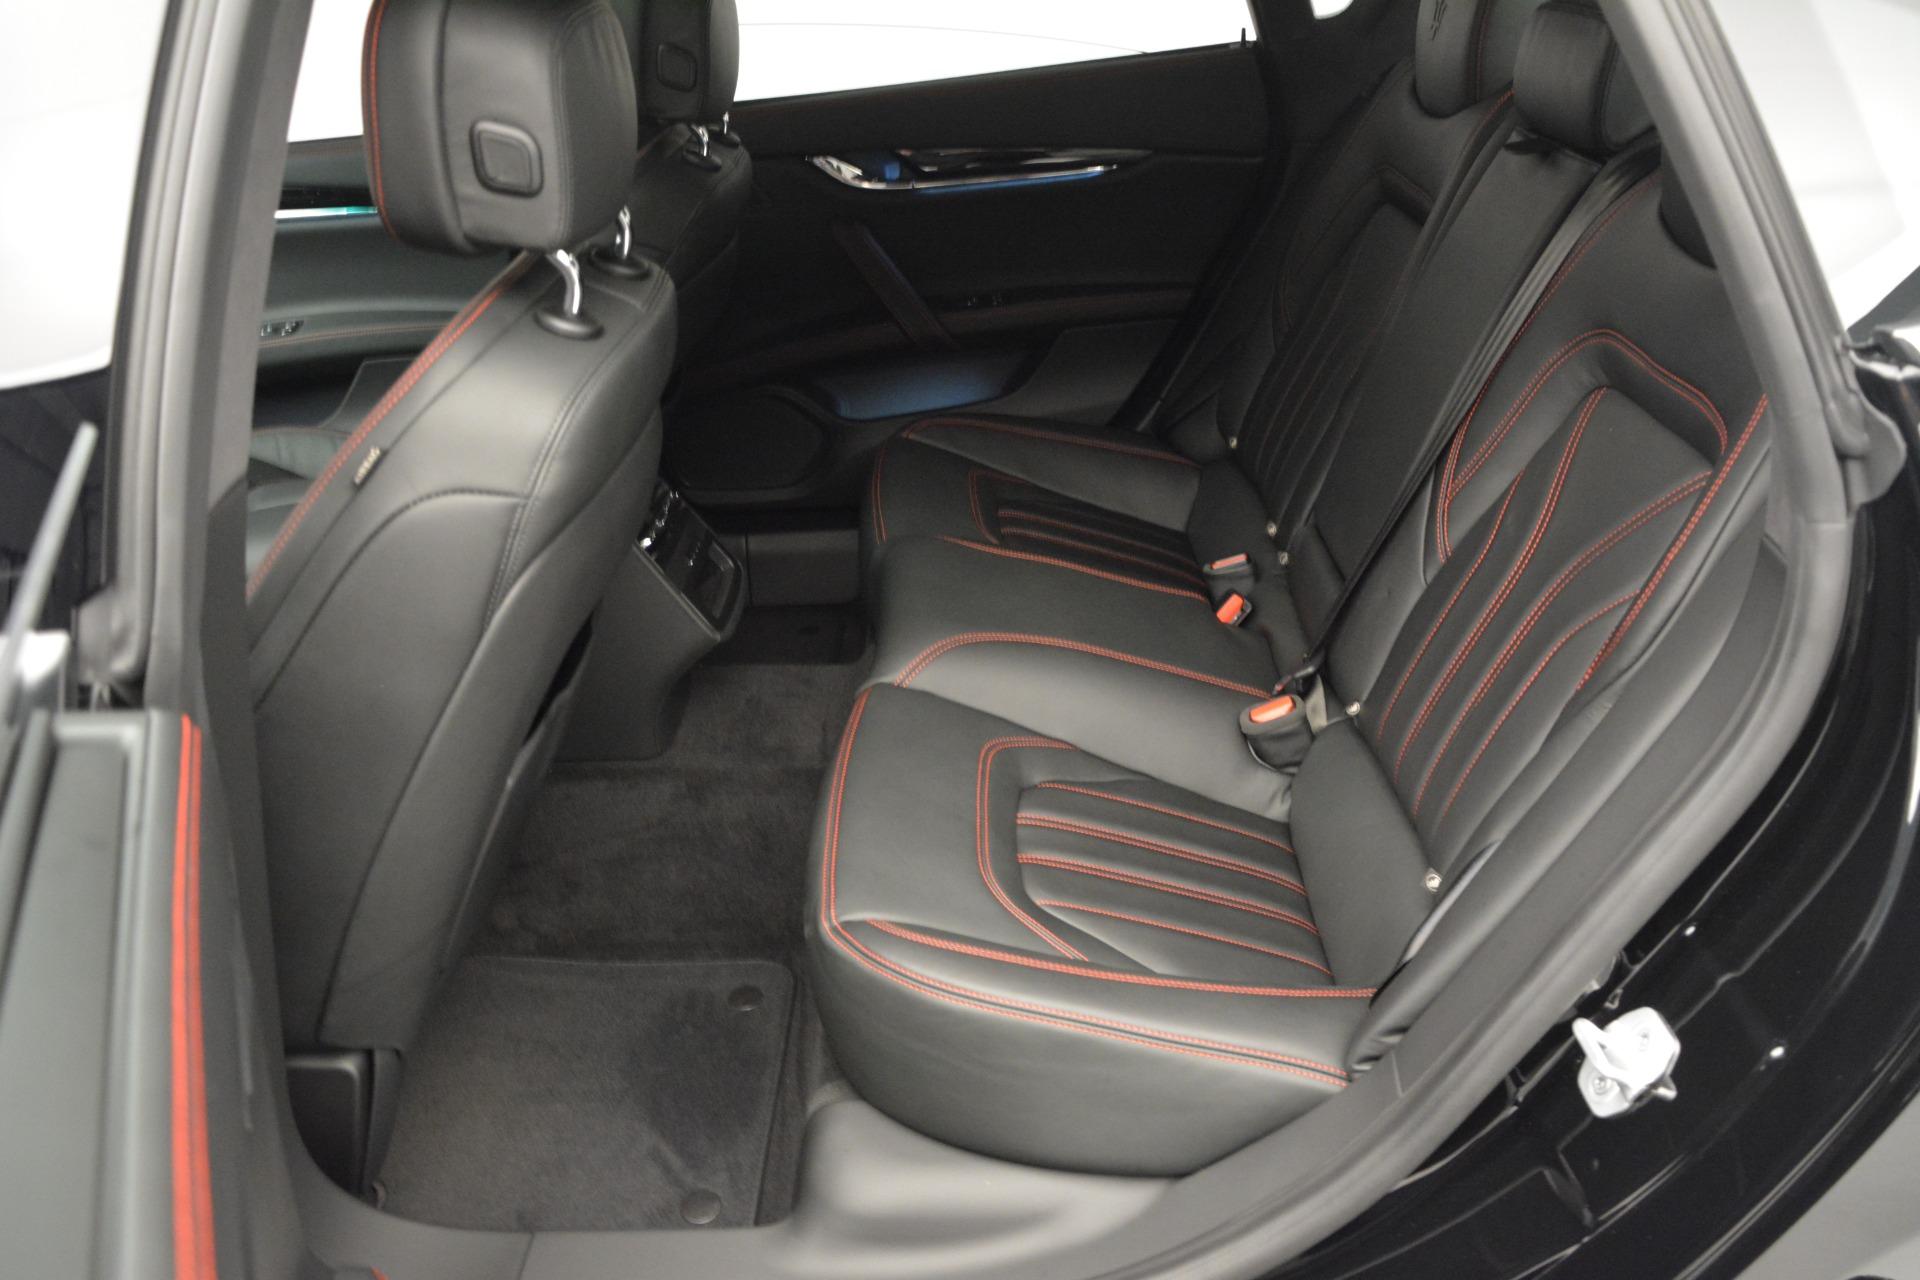 Used 2015 Maserati Quattroporte GTS For Sale In Westport, CT 2993_p20